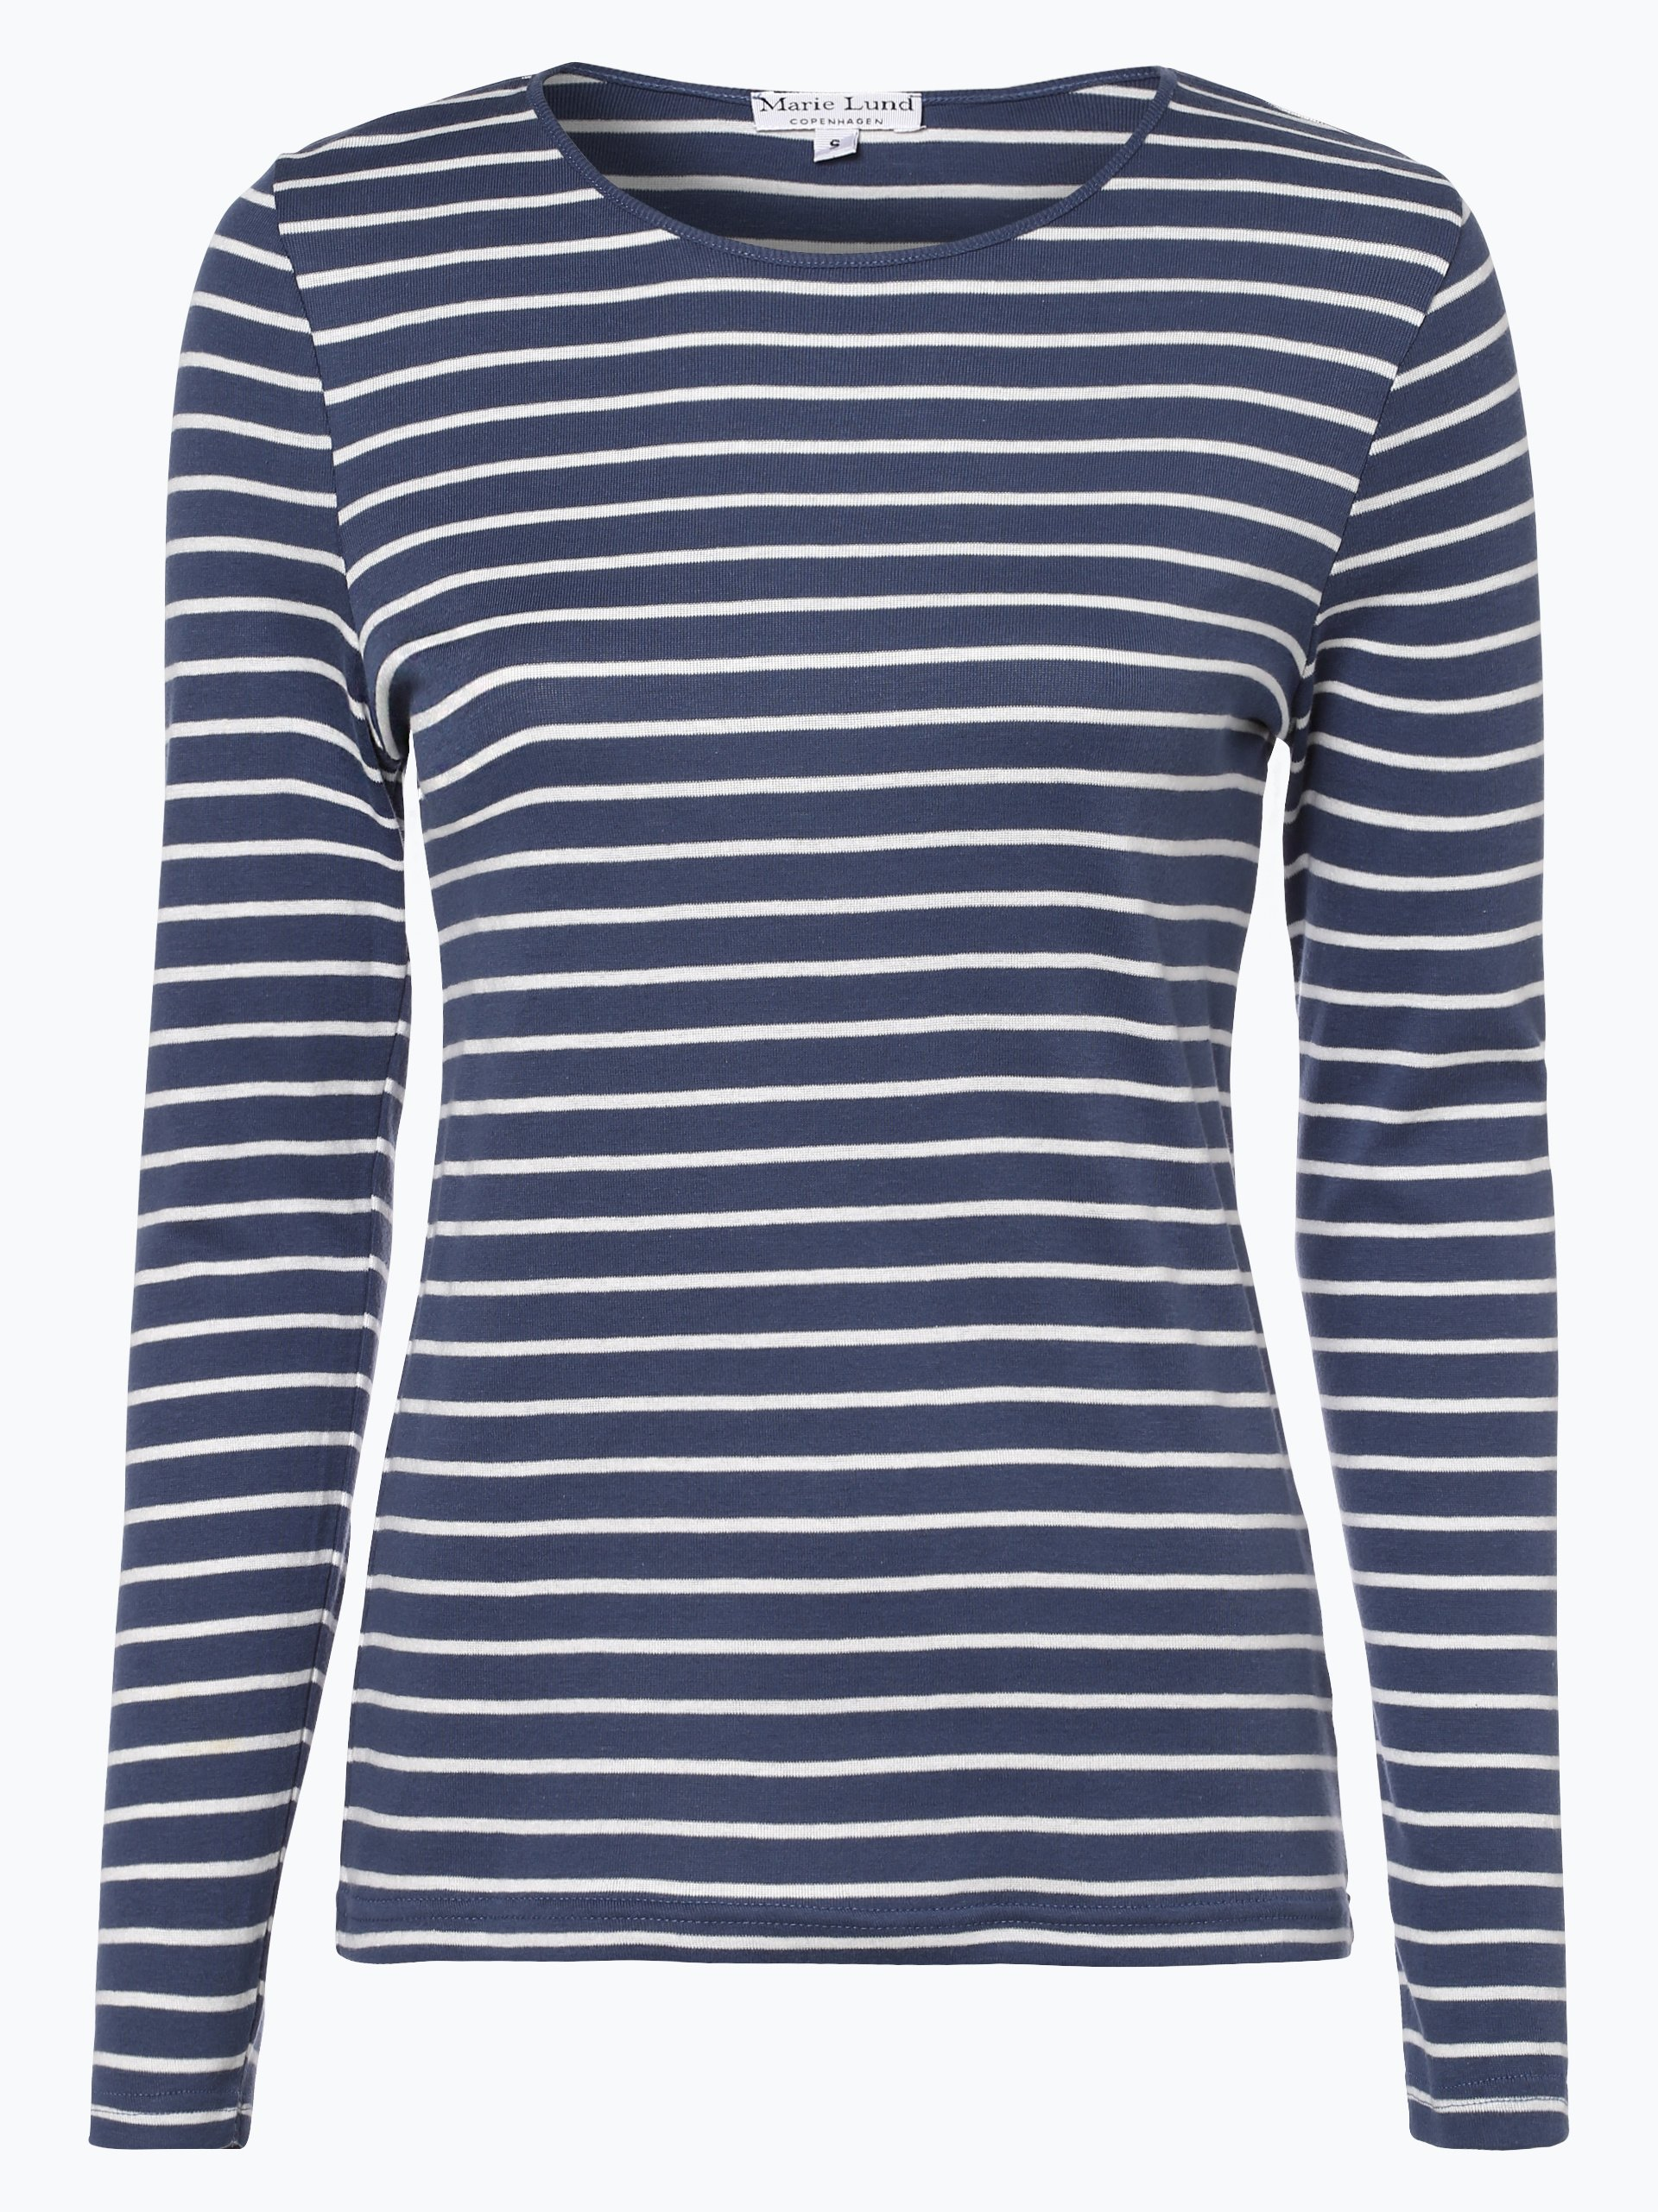 marie lund damen langarmshirt blau gestreift online kaufen vangraaf com. Black Bedroom Furniture Sets. Home Design Ideas